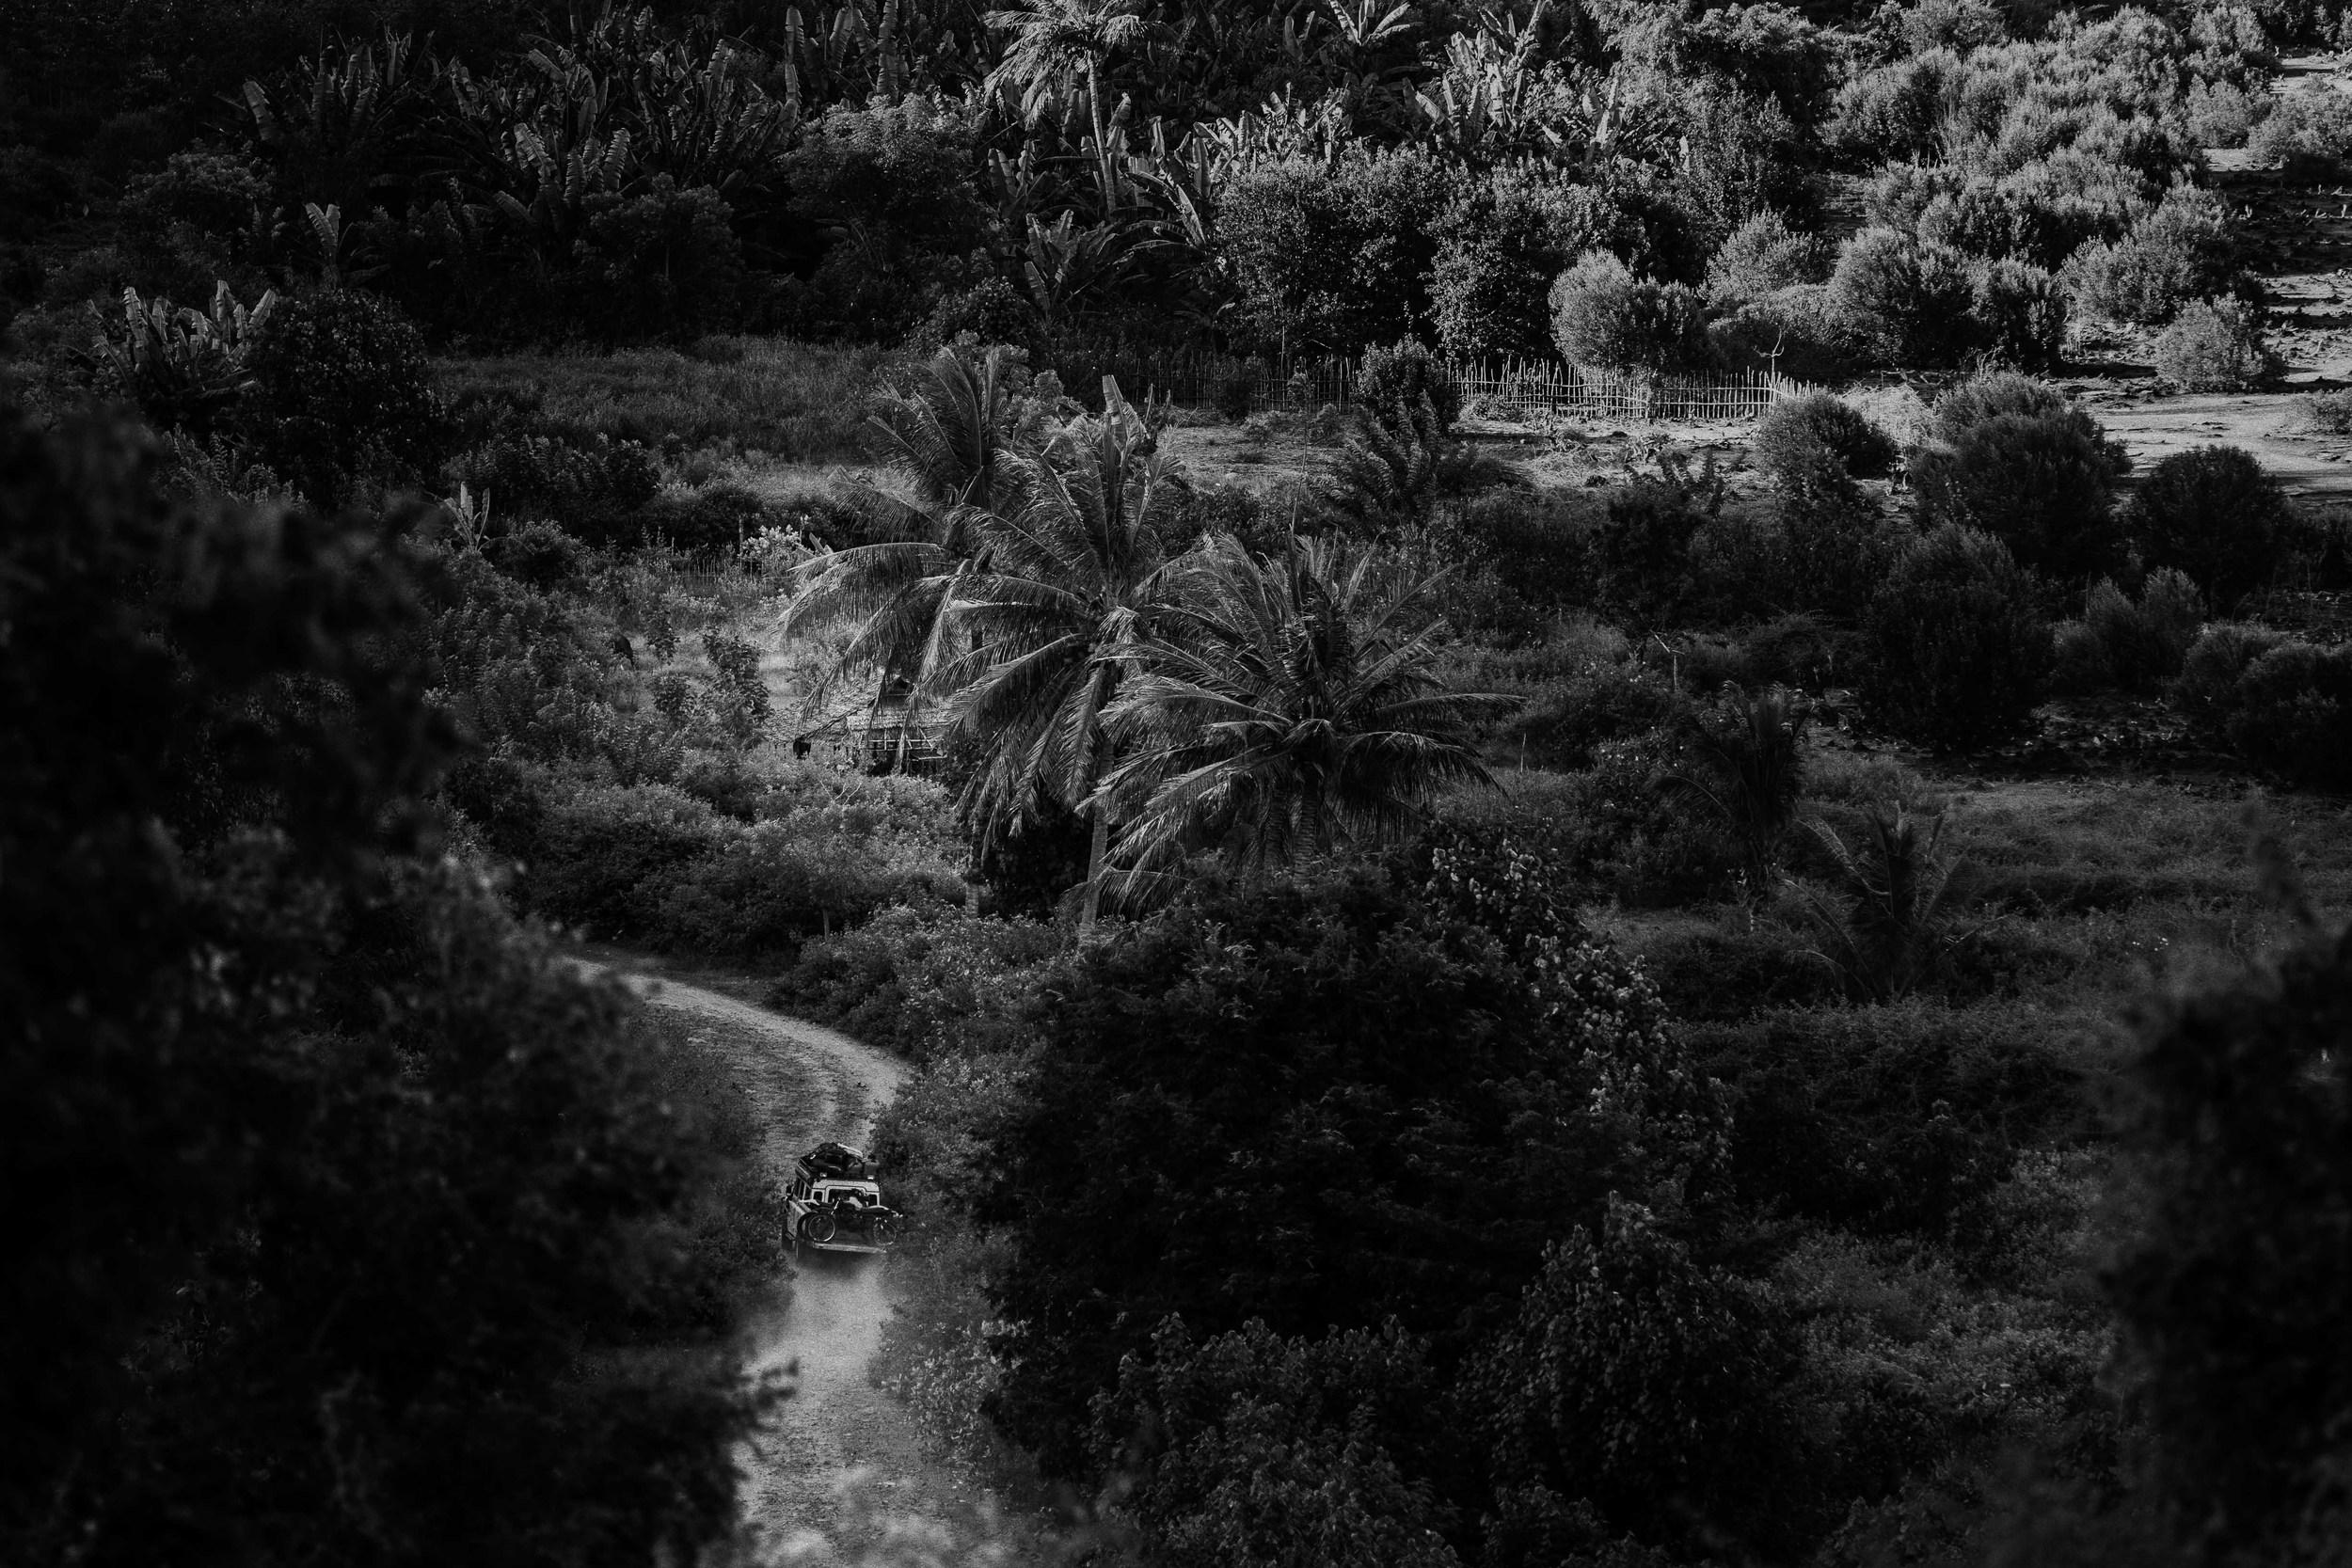 1_Lombok_South_To_Sian_Wall_Photos128-copy.jpg